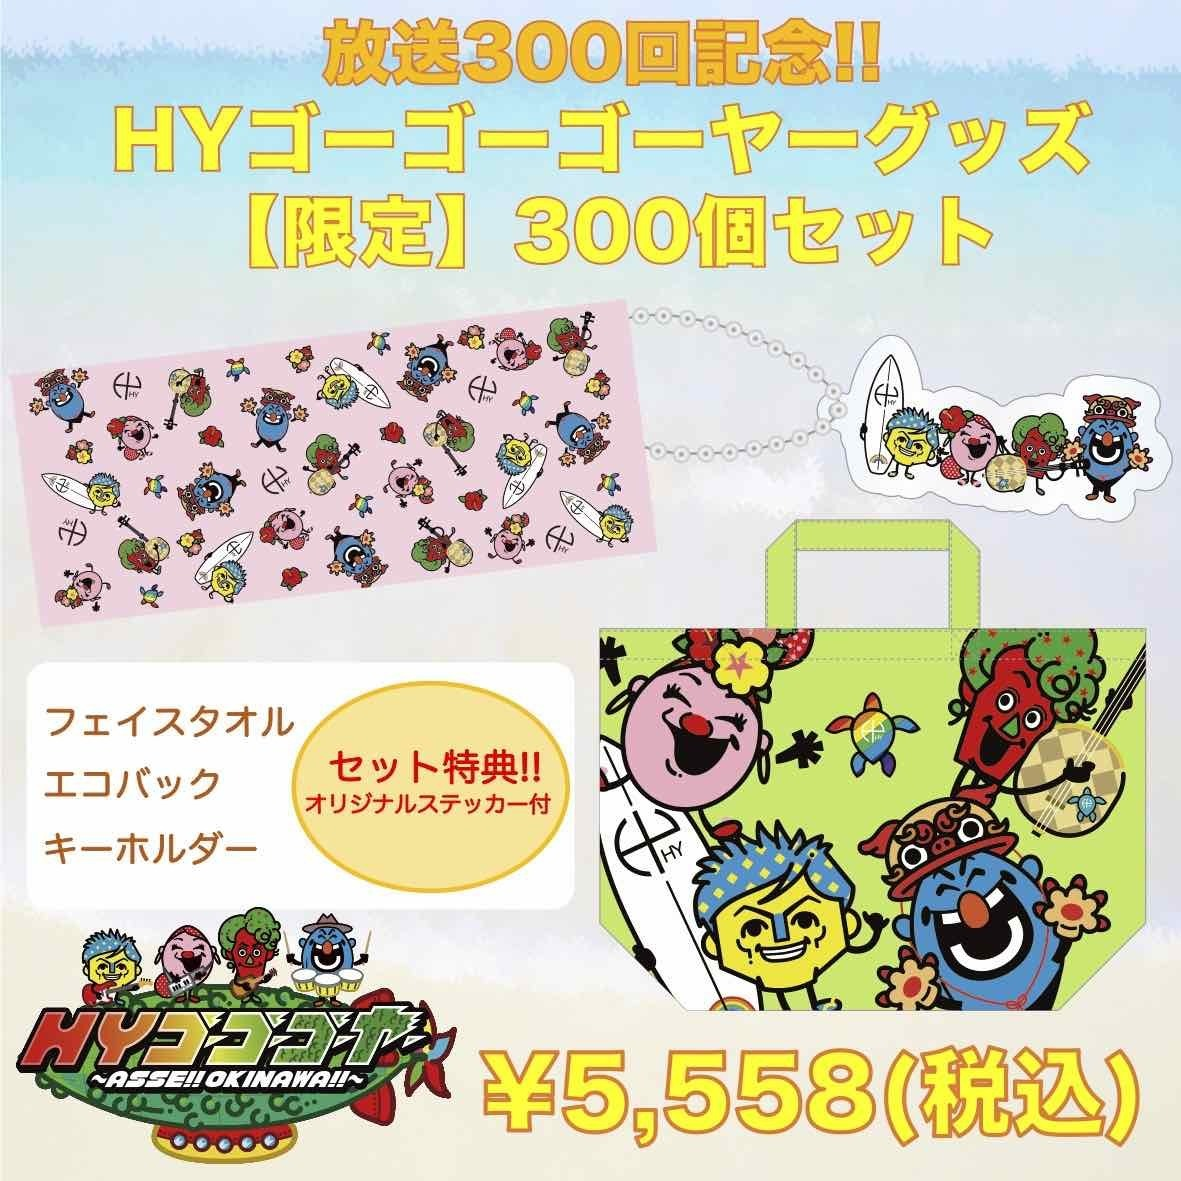 HYゴーゴーゴーヤー放送300回記念【限定300個セット】